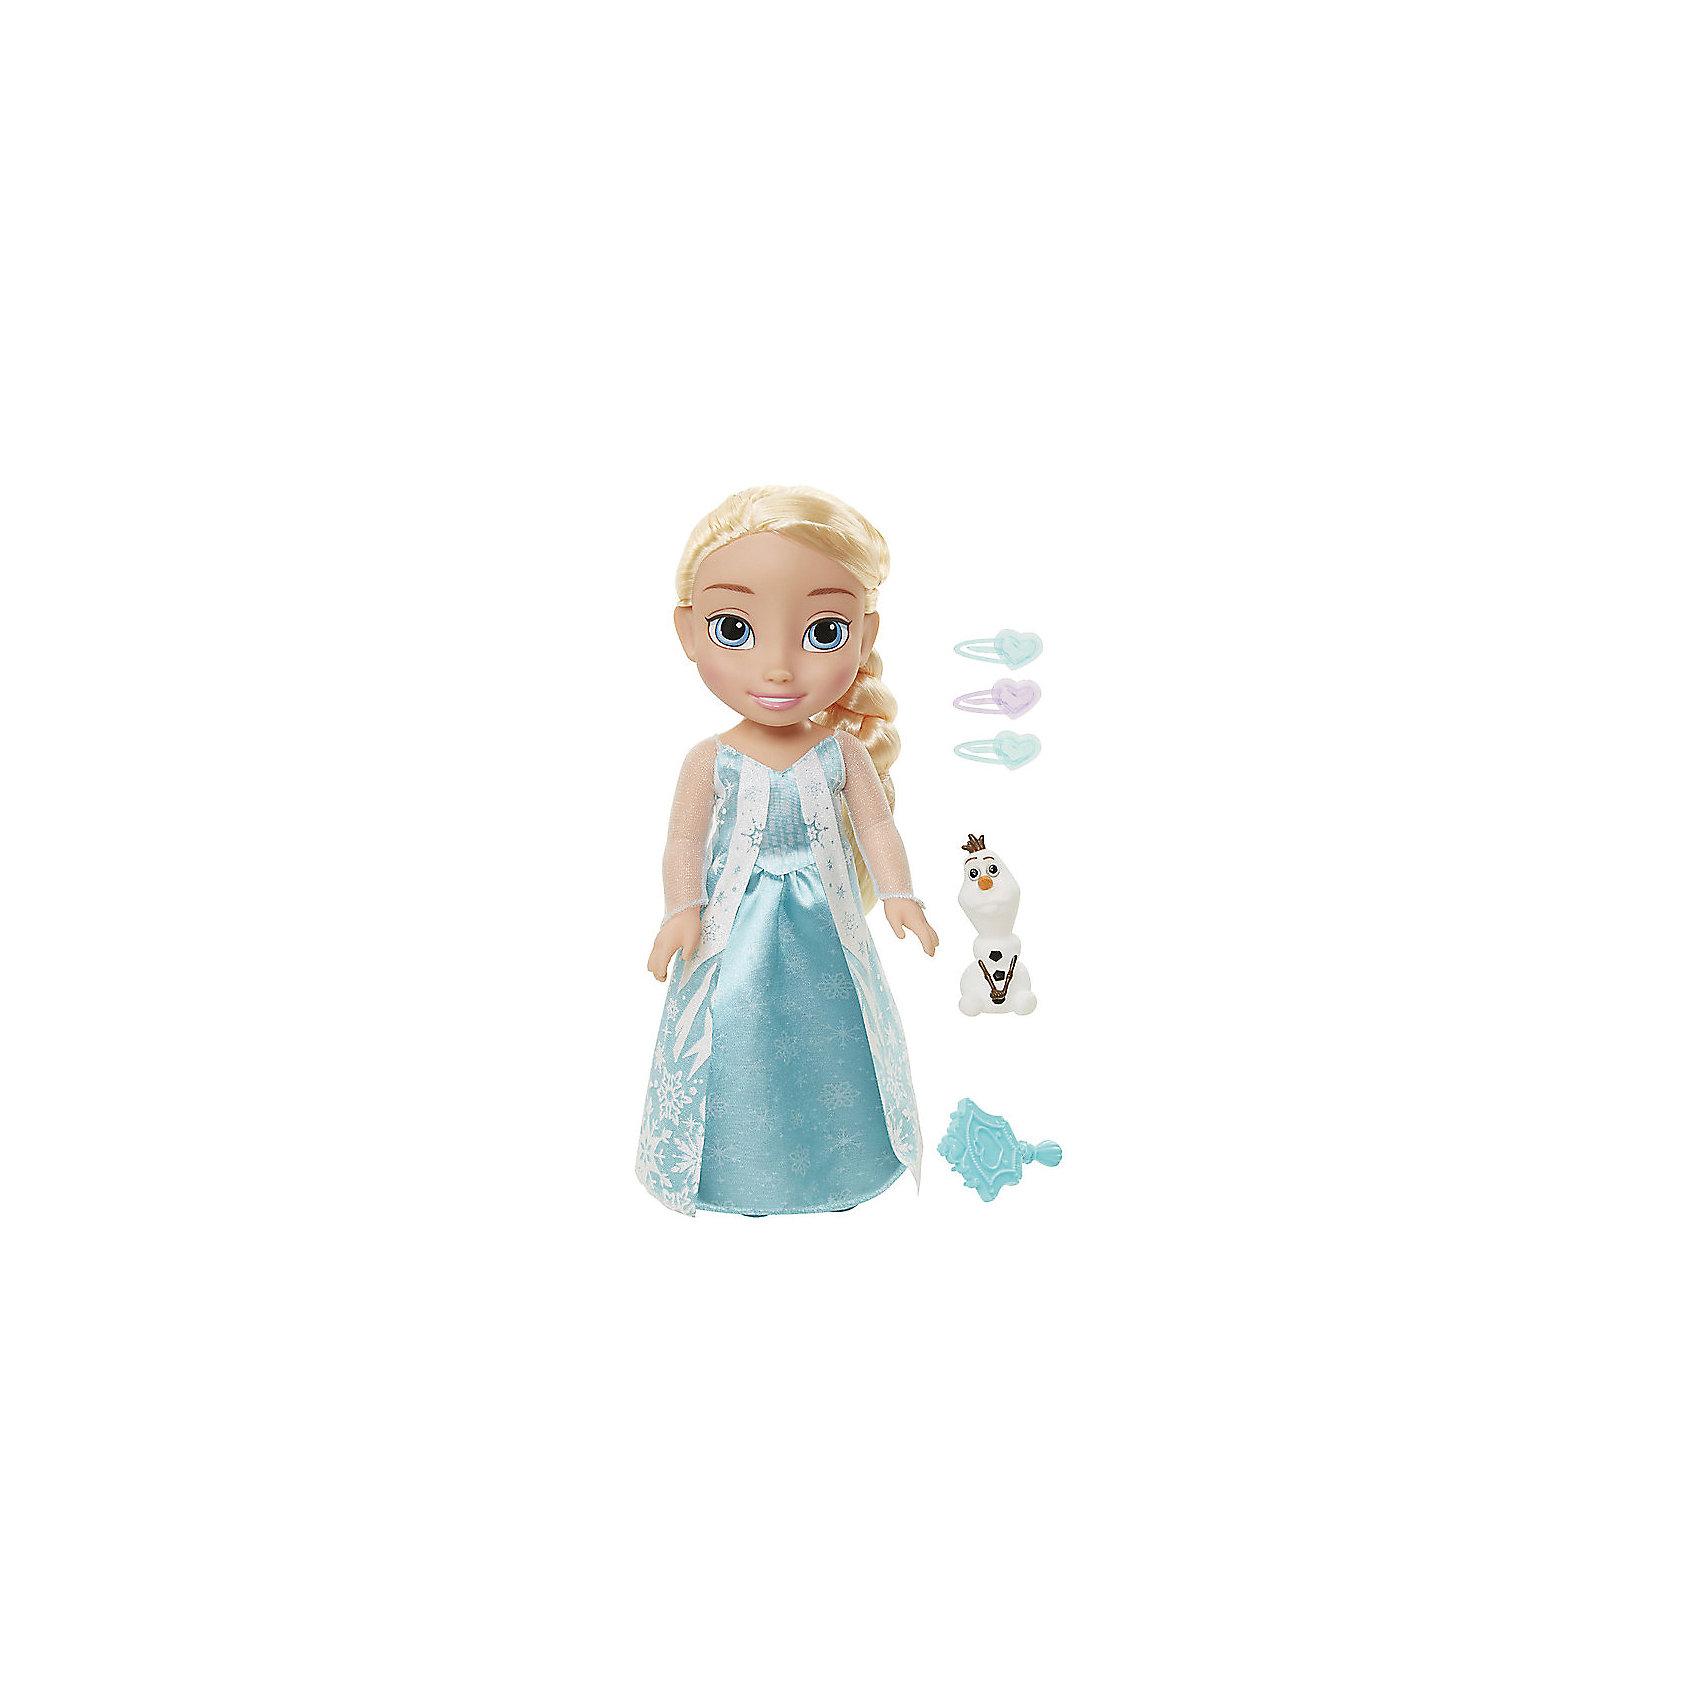 Jakks Pacific Кукла-малышка Холодное сердце с аксессуарами, Эльза, 35 см. кукла jakks pacific аврора